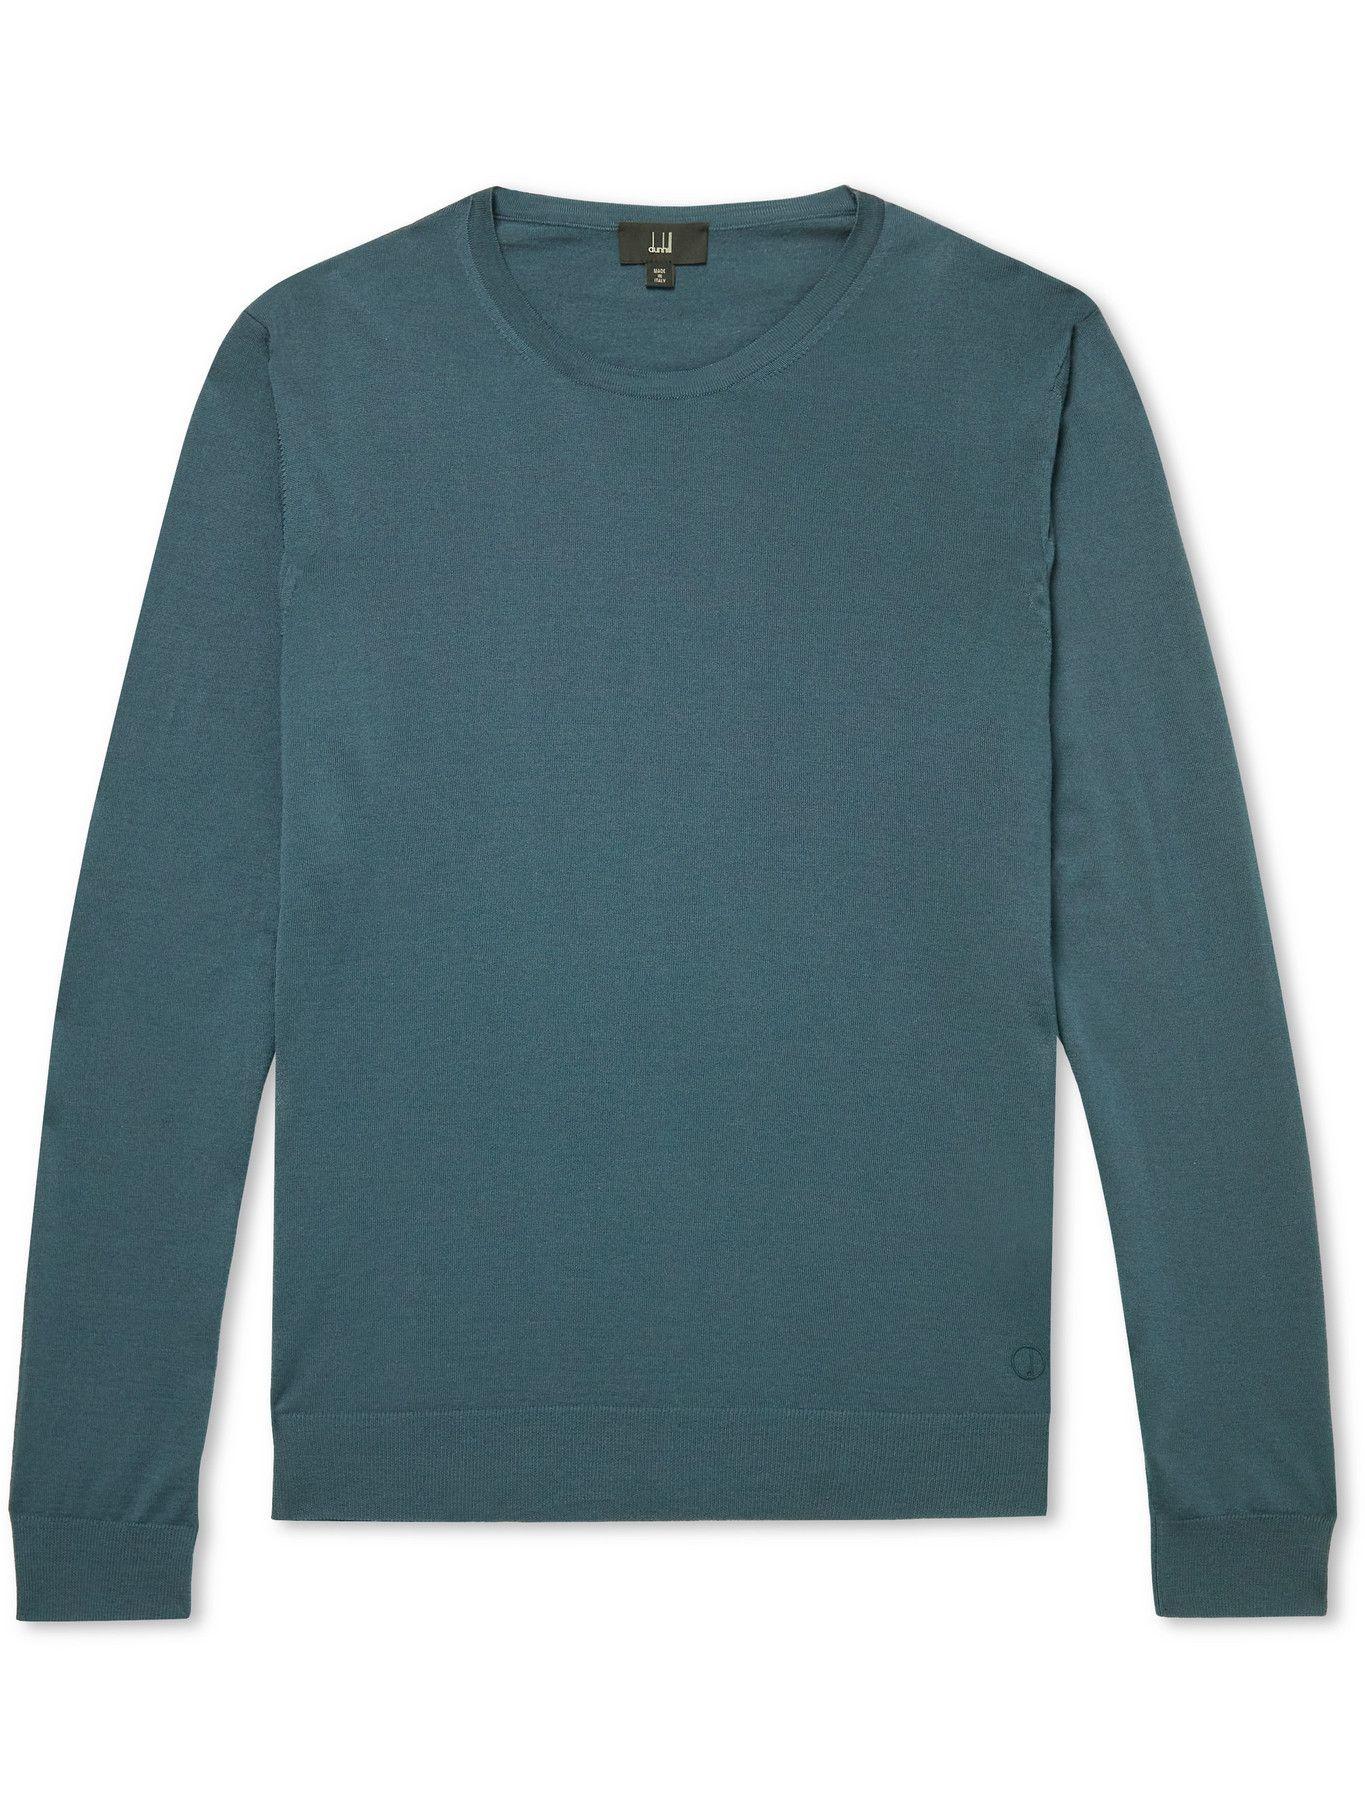 Dunhill - Merino Wool Sweater - Blue